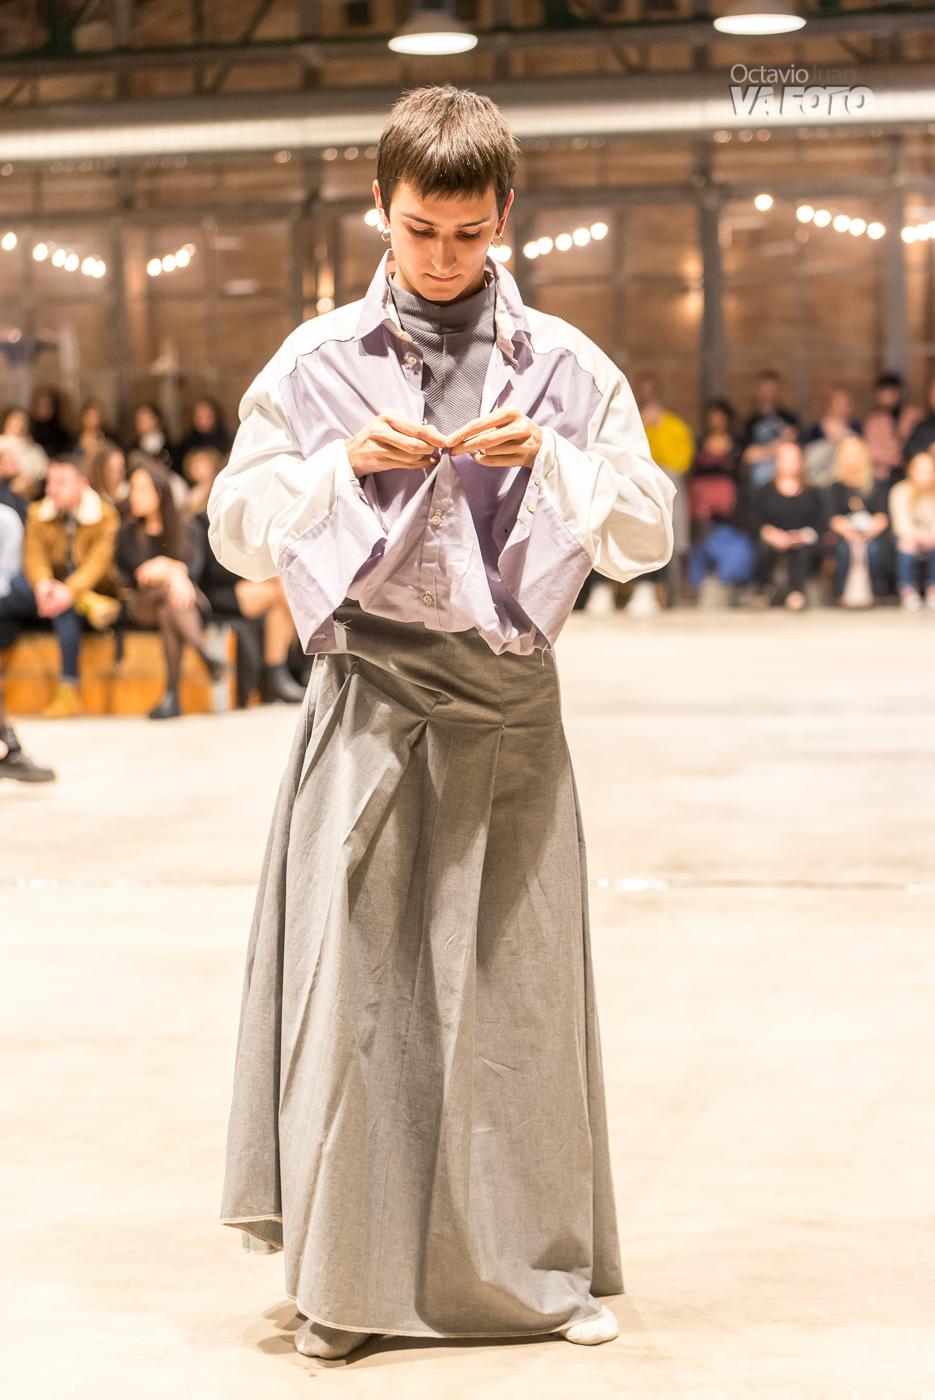 00262 ARTEMODA DSC4361 20181124 - Evento: Arte + Moda Valencia